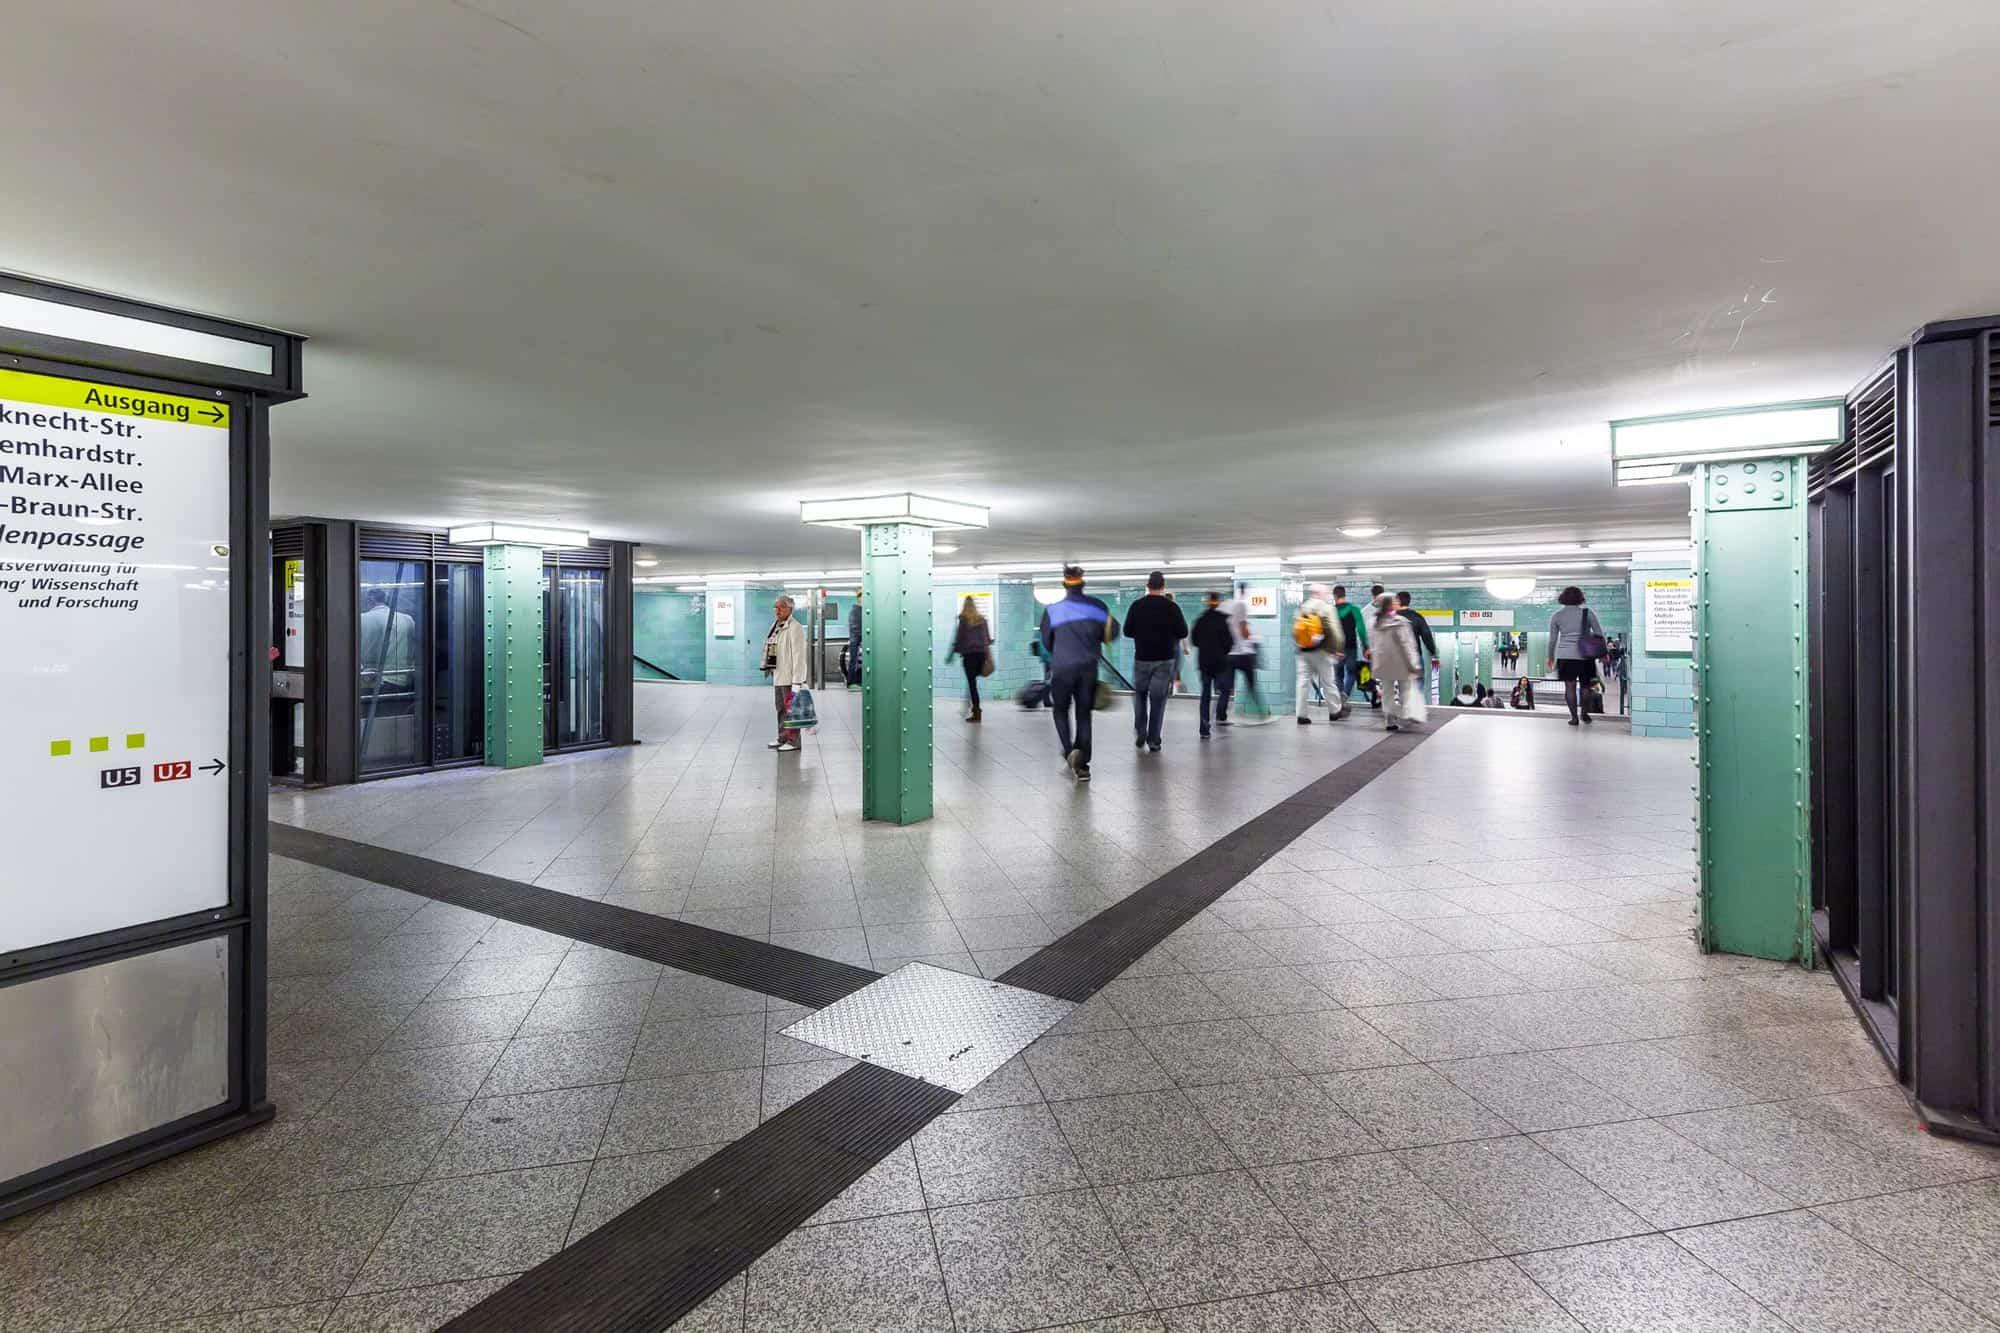 S2 - U Bahnhof Alexanderplatz – Berlin Eingang